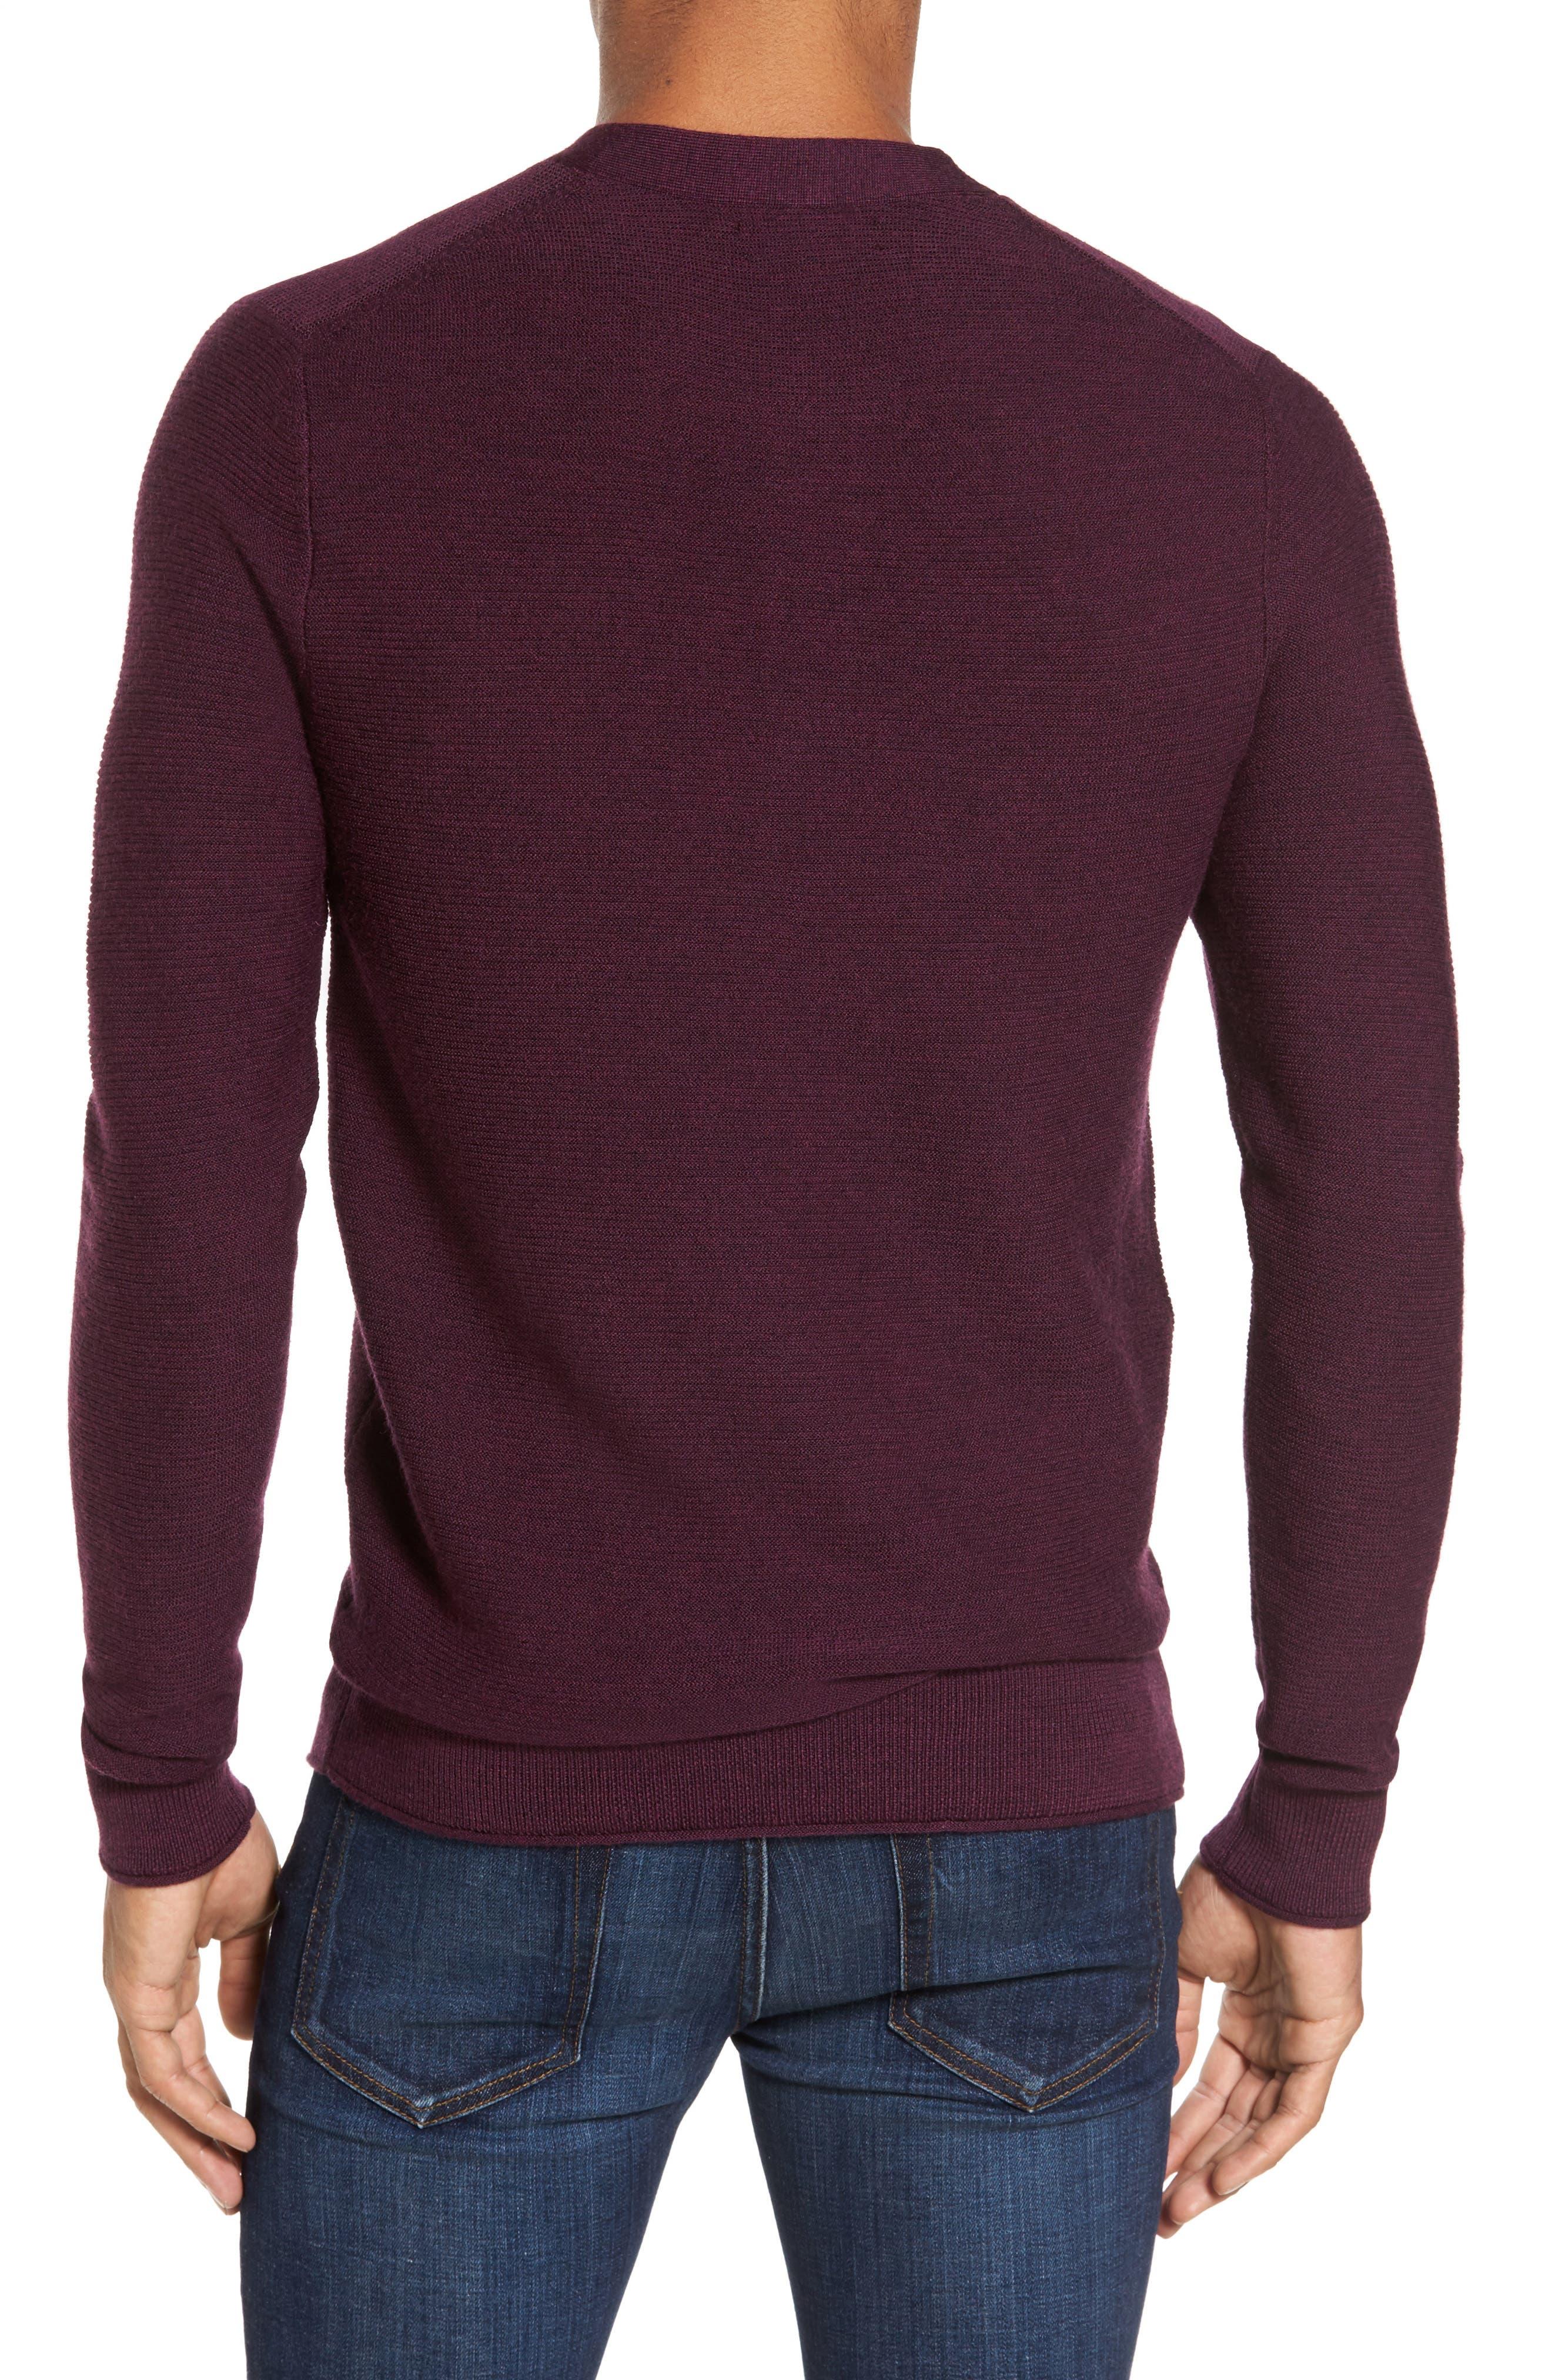 Alternate Image 2  - Bonobos Slim Fit Merino Long Sleeve Henley Sweater